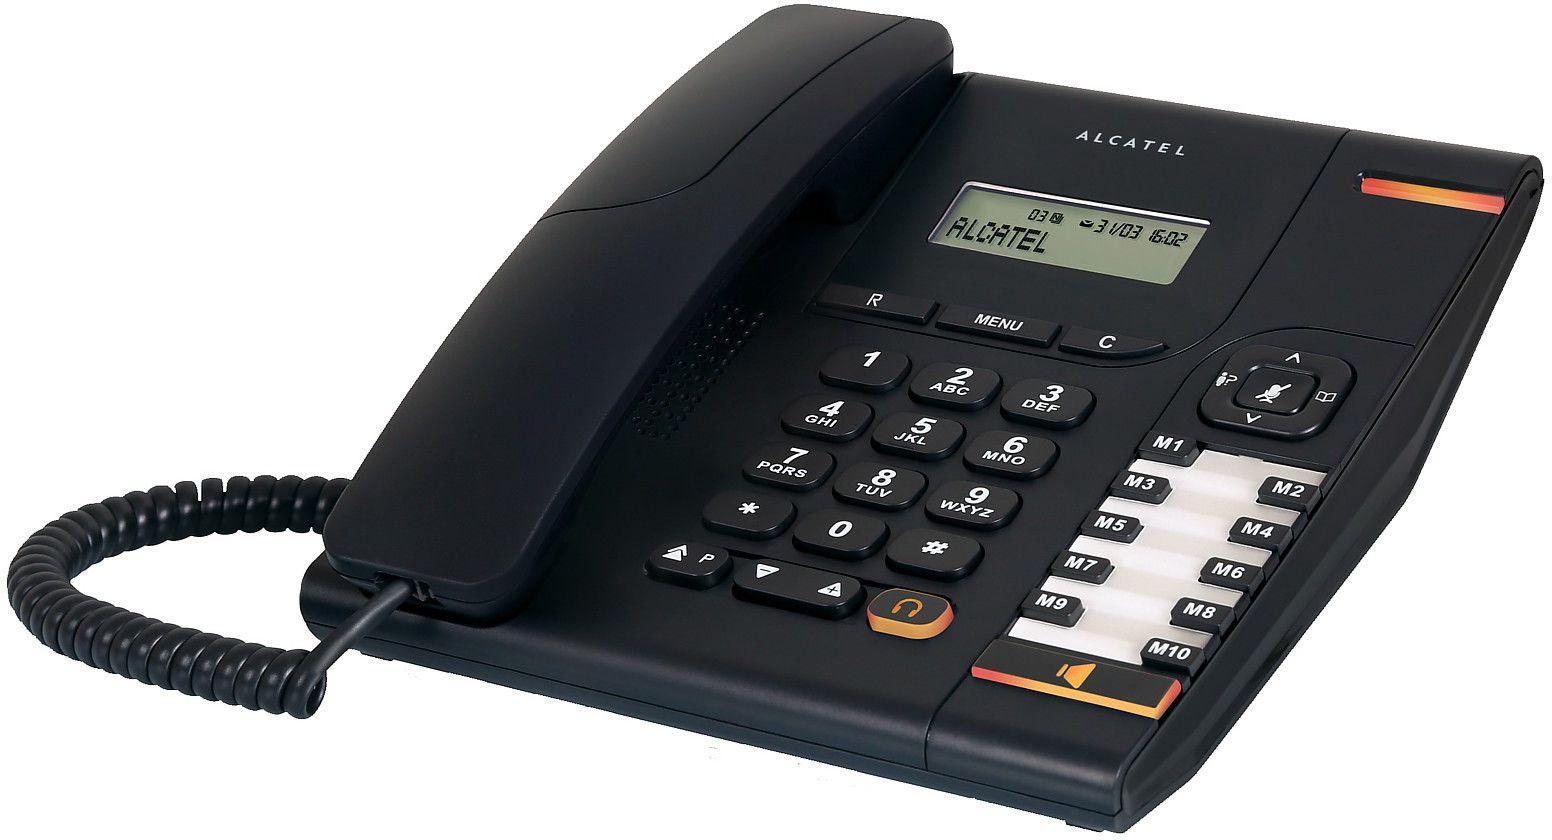 Telefon Temporis 580 ALCATEL